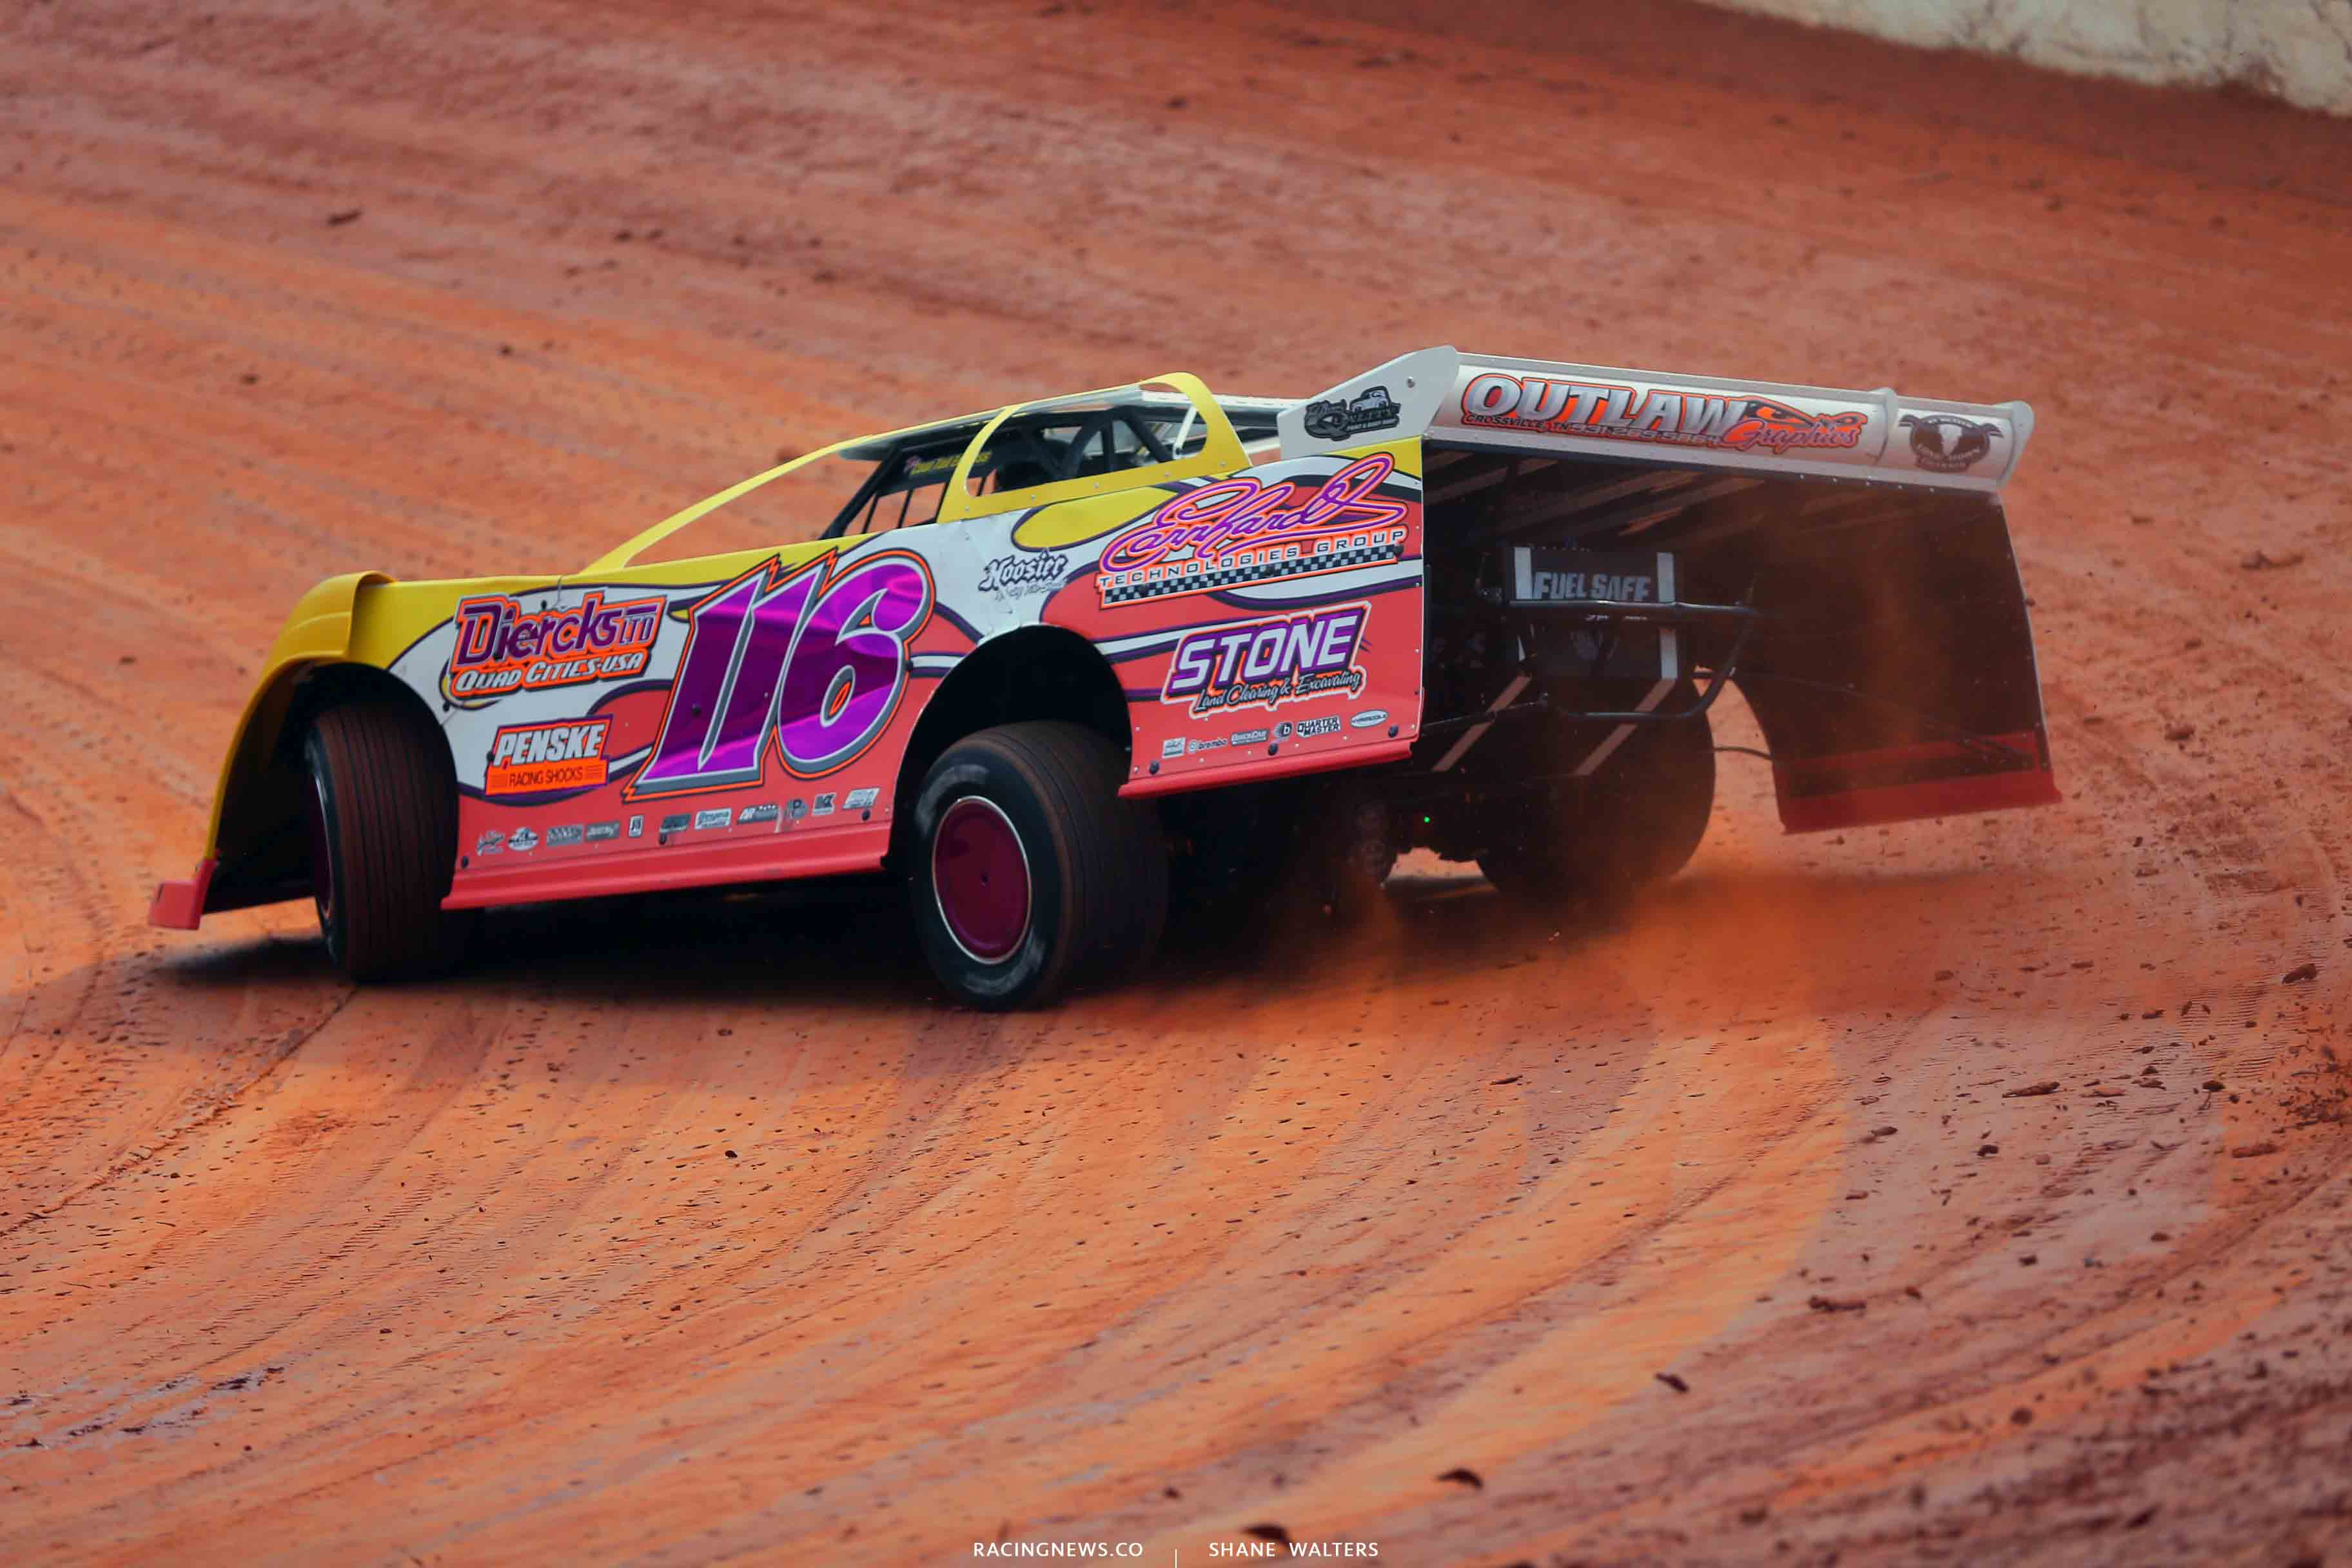 Cameron Weaver - Randy Weaver Racing at 411 Motor Speedway 1105